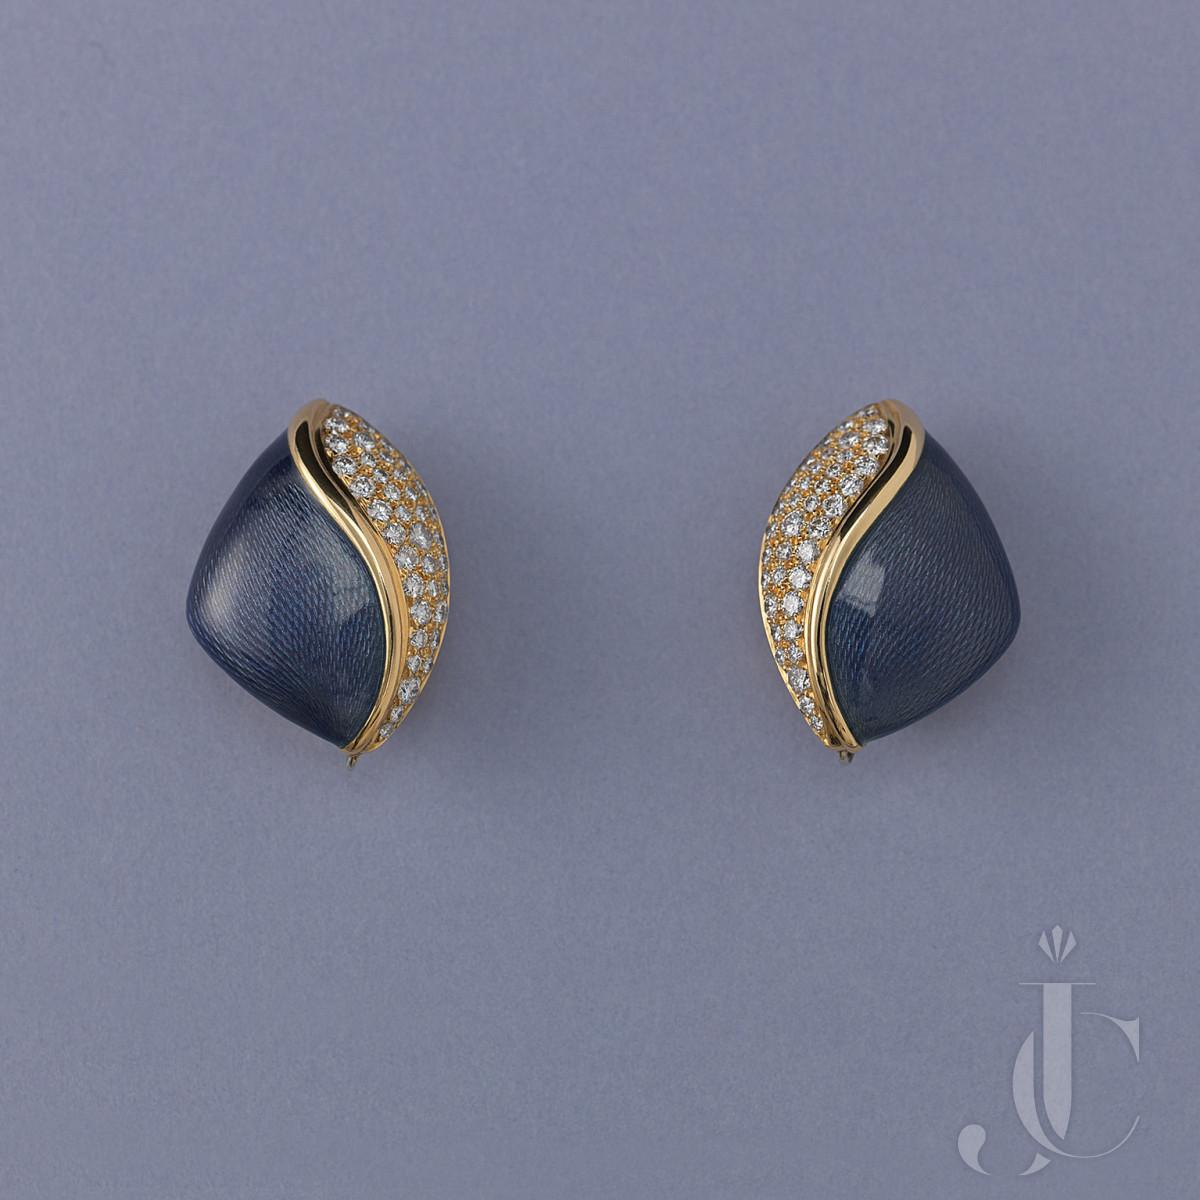 DE VROOMEN GOLD EAR CLIPS WITH DIAMONDS AND PURPLE ENAMEL